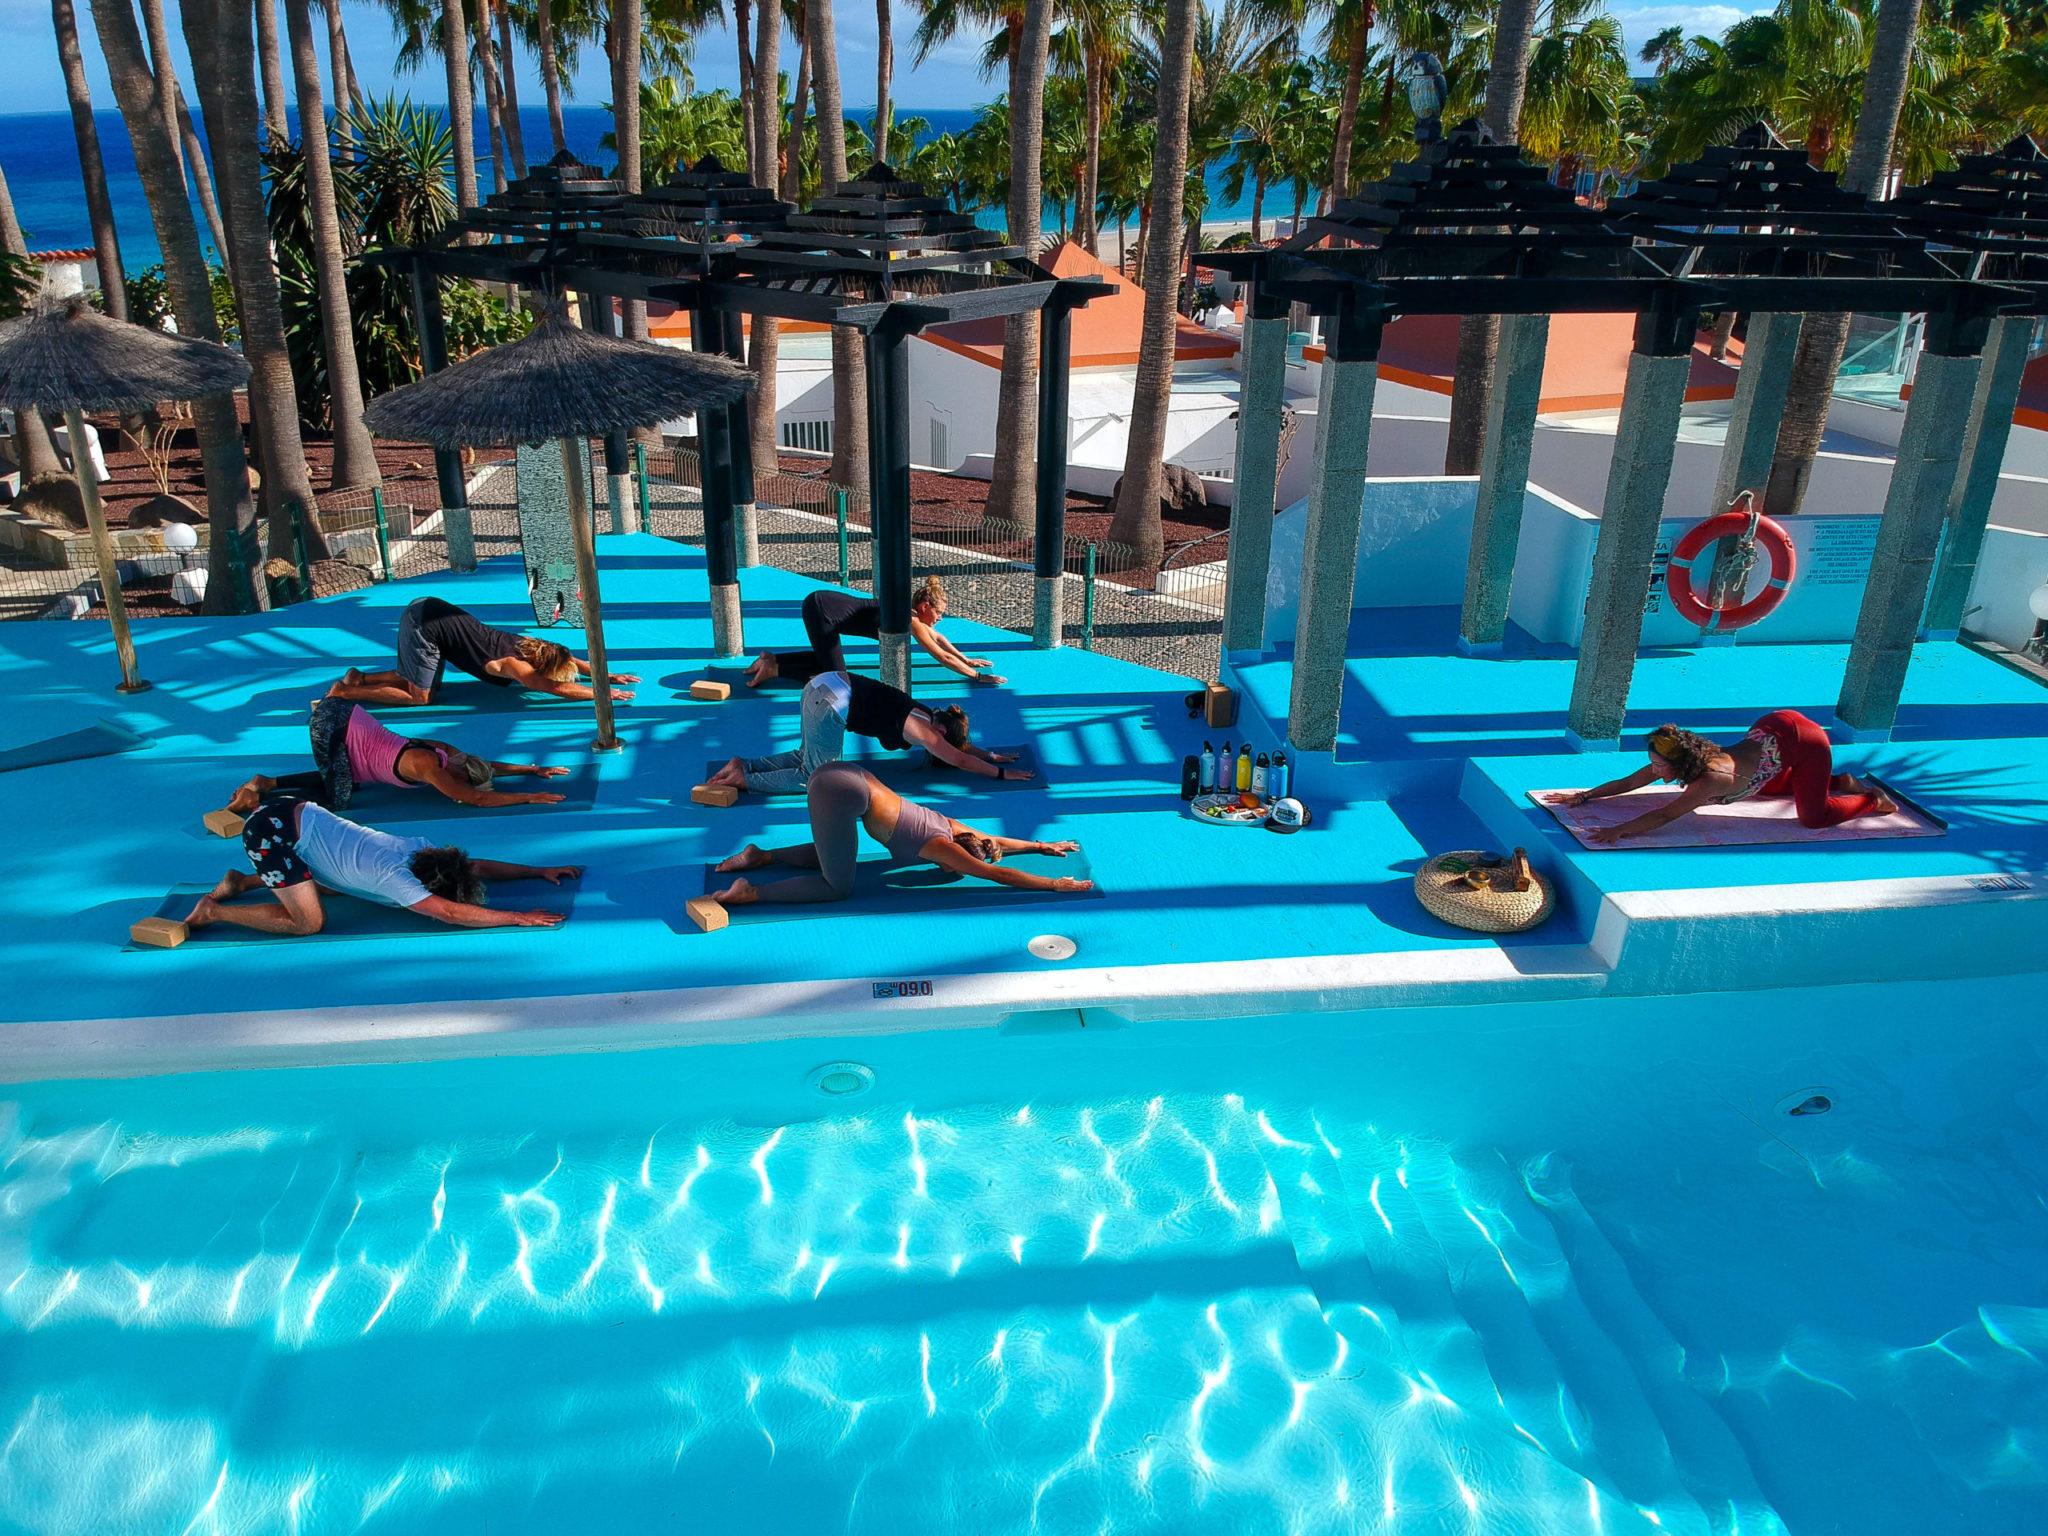 Surf camp in Fuerteventura: Costa Calma surfing & yoga holidays